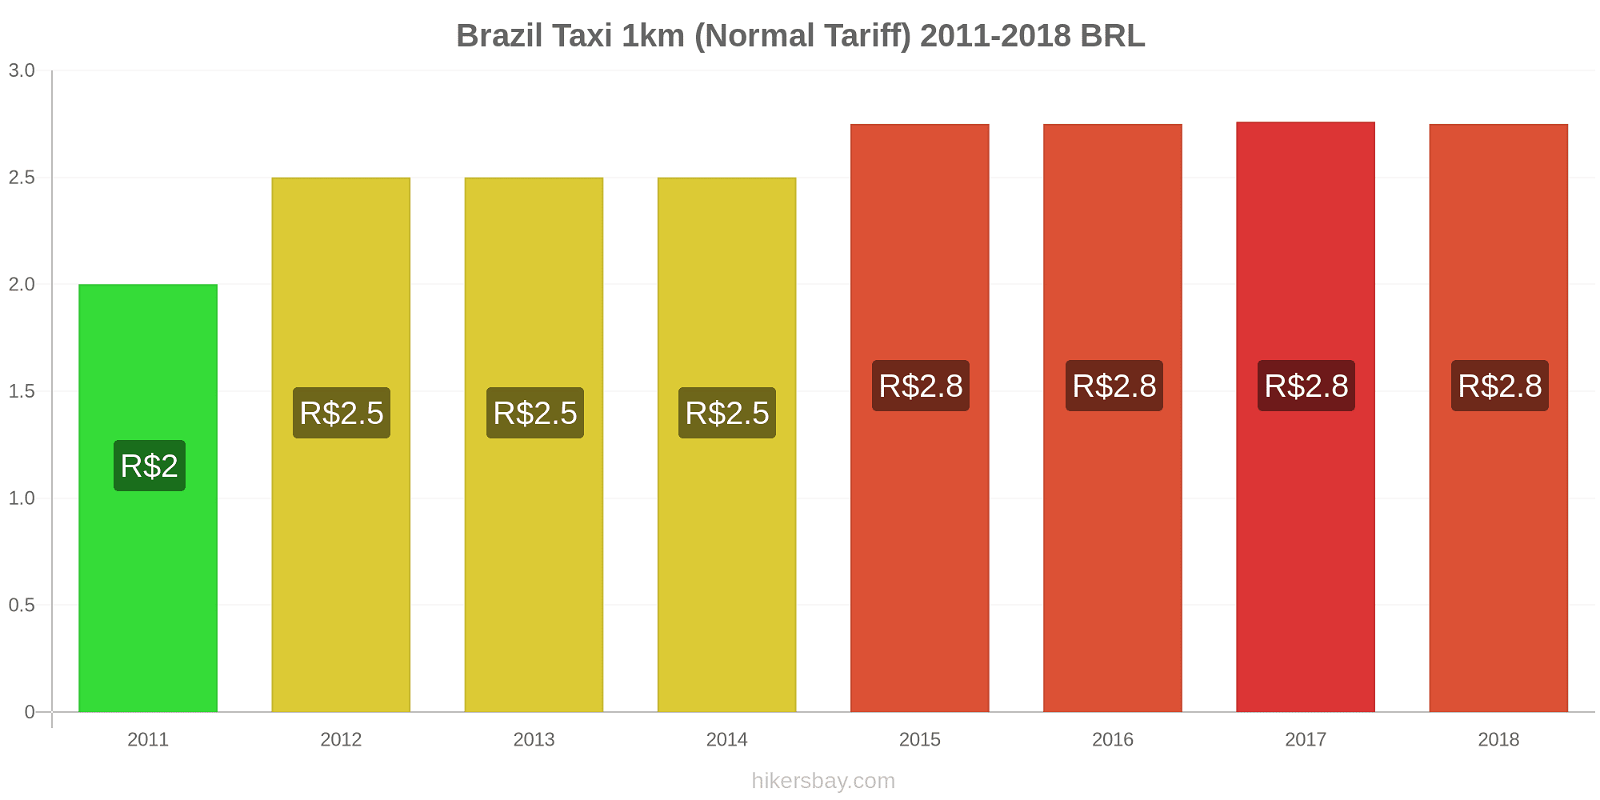 Brazil price changes Taxi 1km (Normal Tariff) hikersbay.com